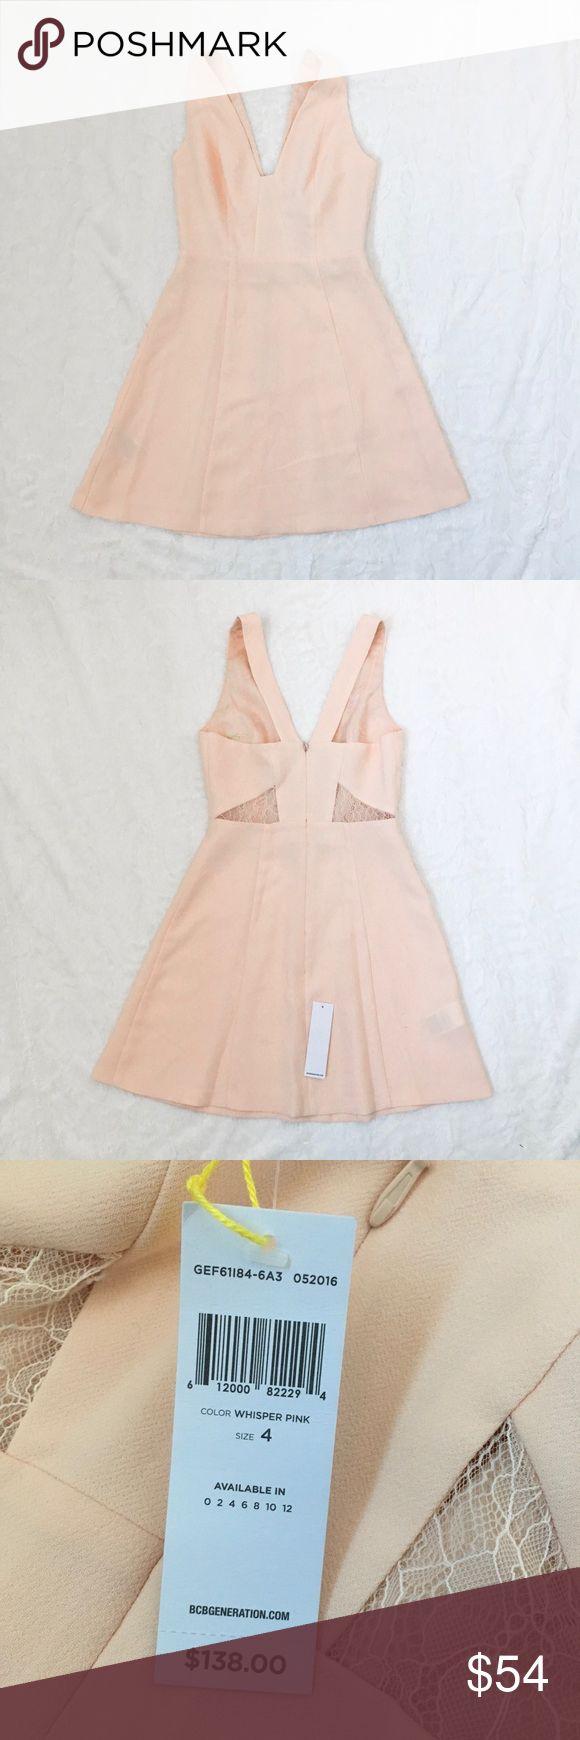 BCBG Peach Lace Dress - BCBGeneration - size 4 - NWT - peach color BCBGeneration Dresses Mini